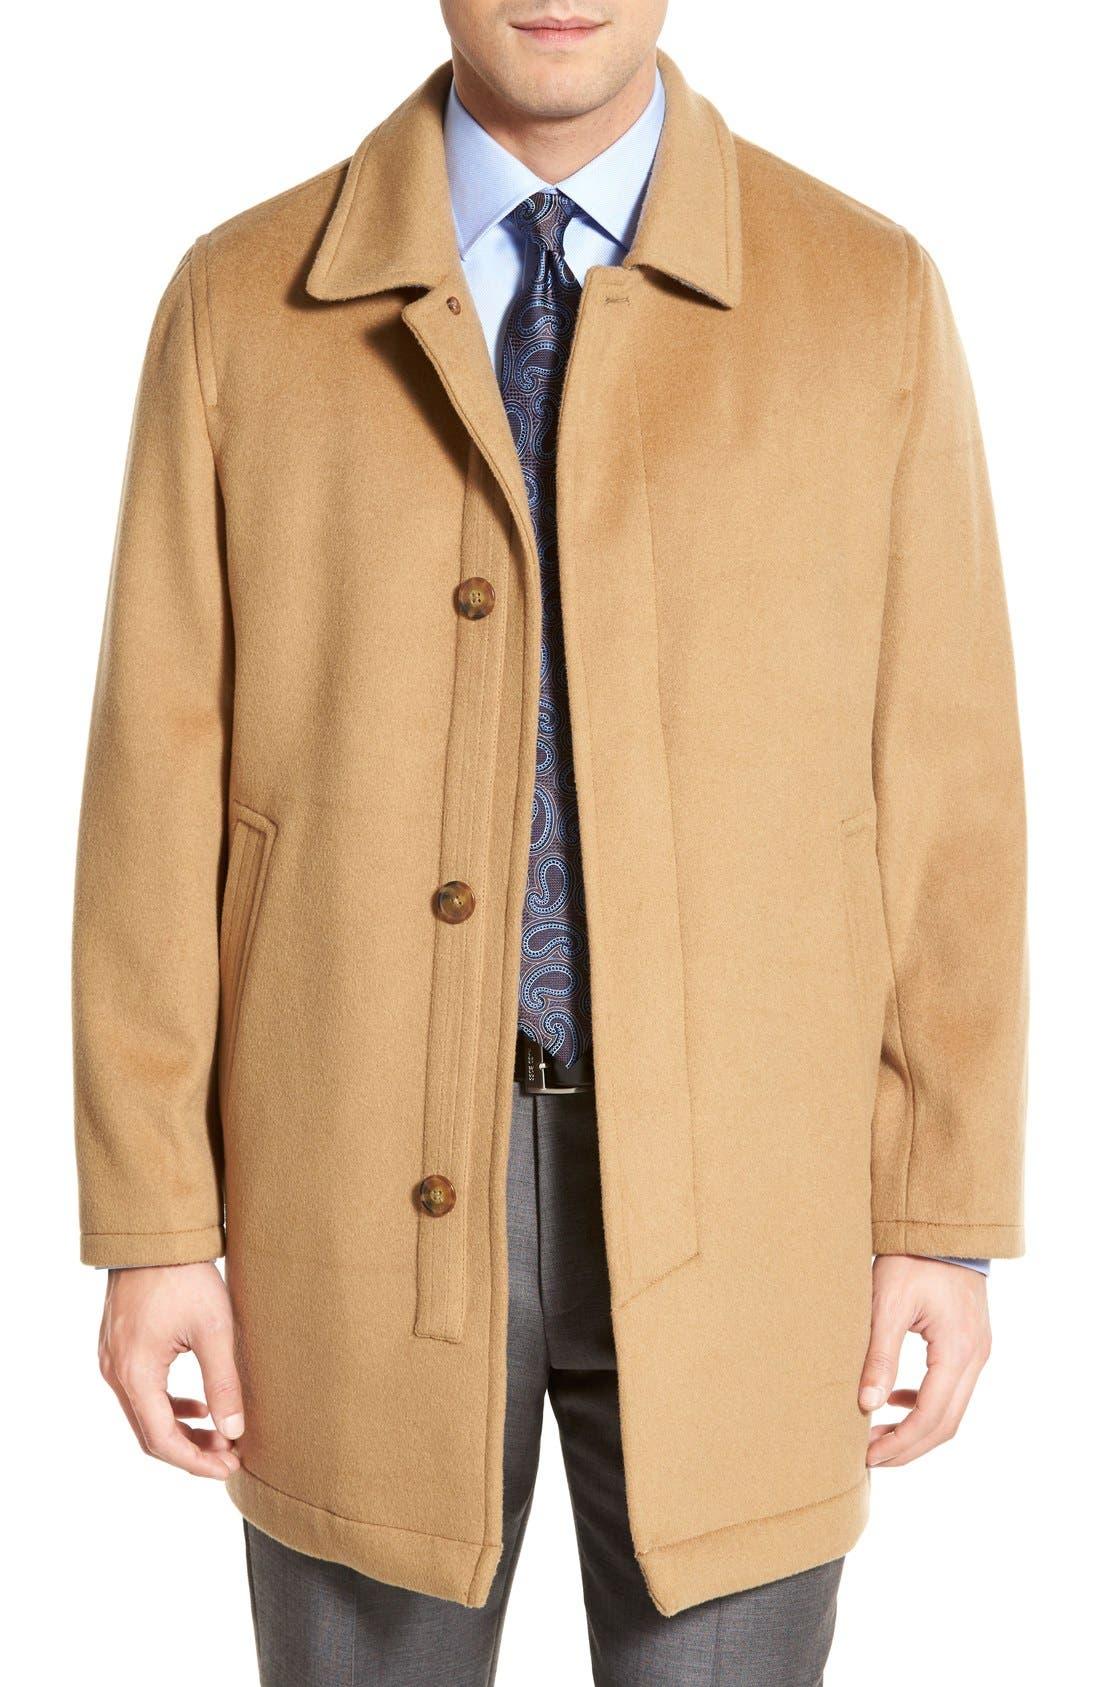 Douglas Modern Fit Wool & Cashmere Overcoat,                             Main thumbnail 1, color,                             Camel